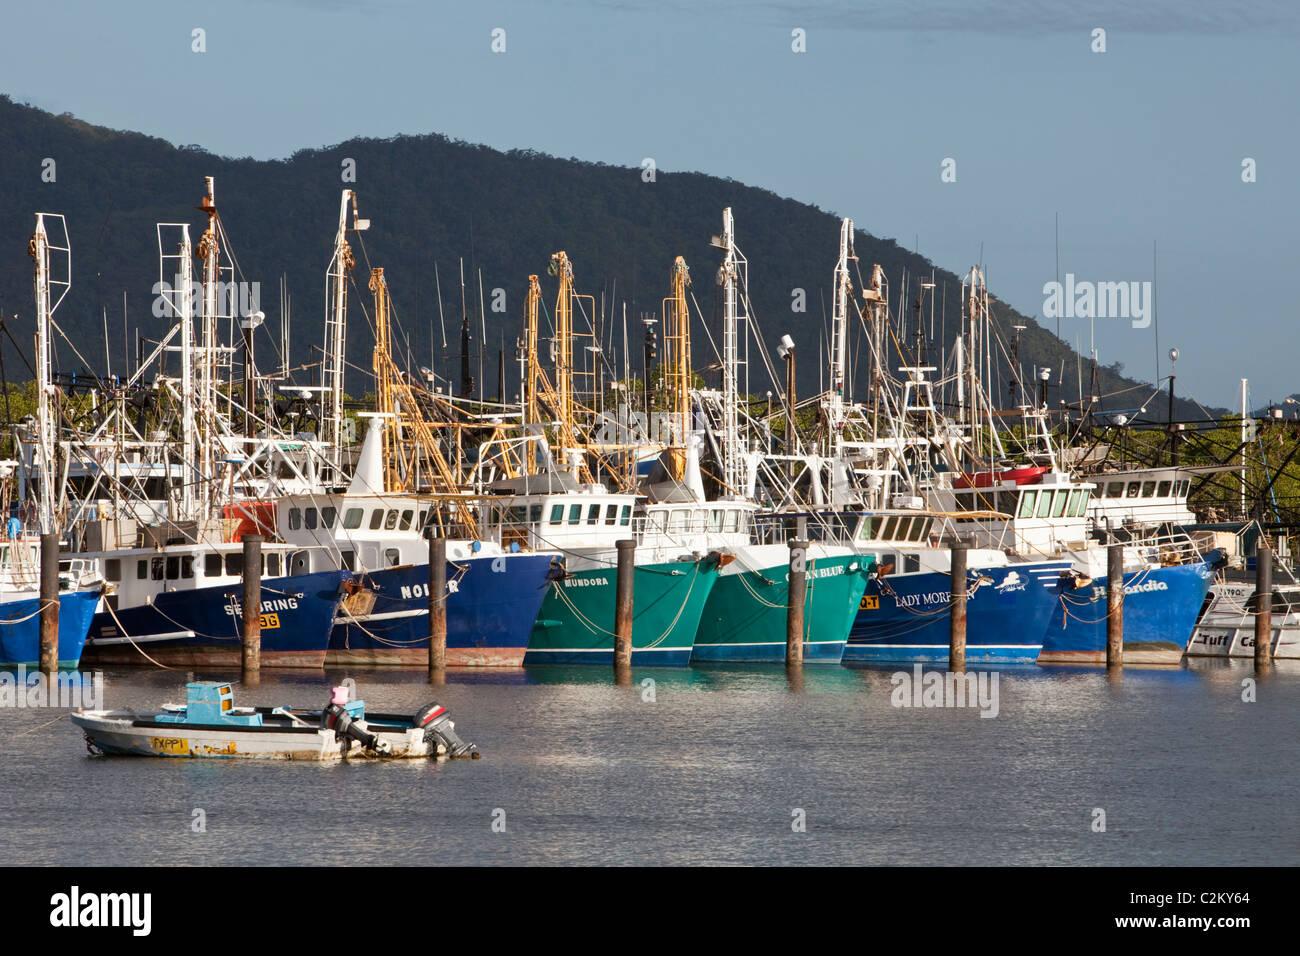 La pesca de arrastre en la base Portsmith. Cairns, Queensland, Australia Foto de stock